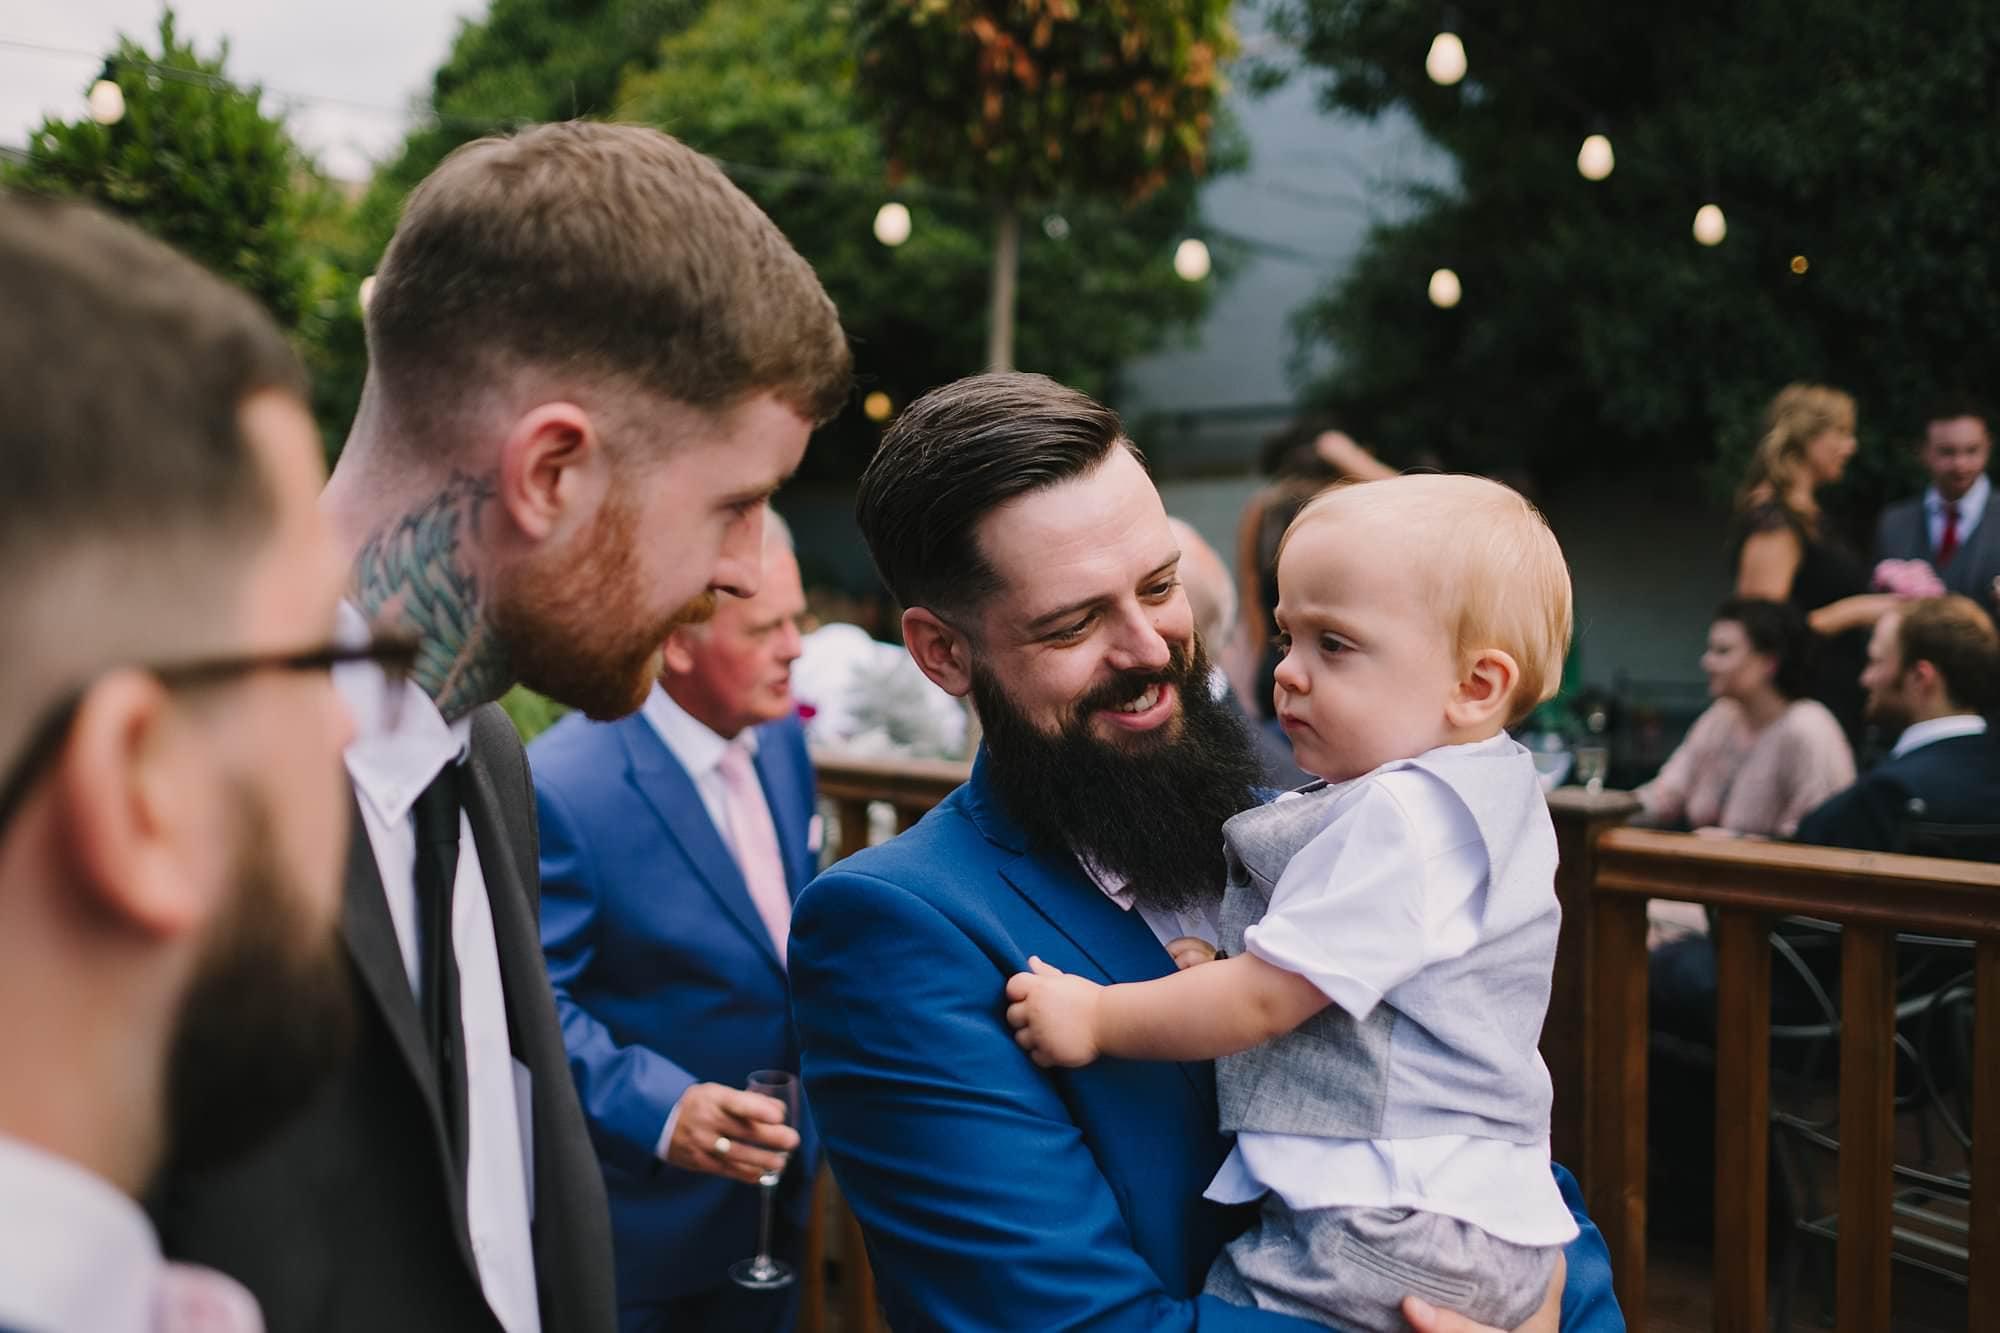 london pub wedding photographer jn 021 - The County Arms Wedding Photographer   Jen & Nick